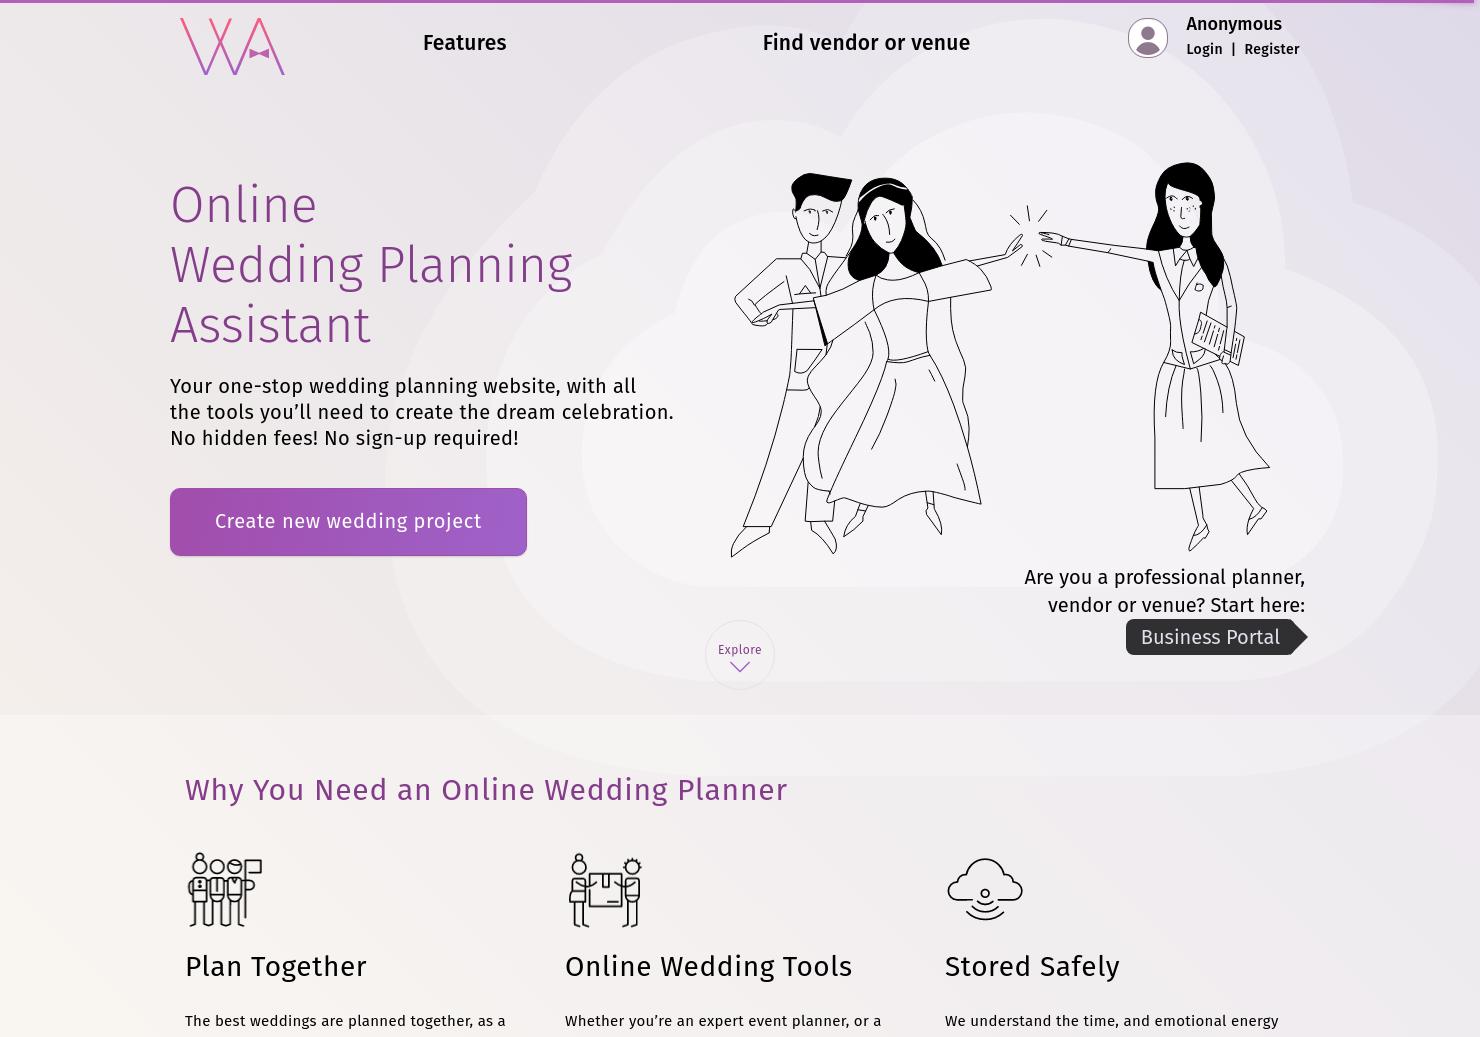 Wedding Planning Assistant